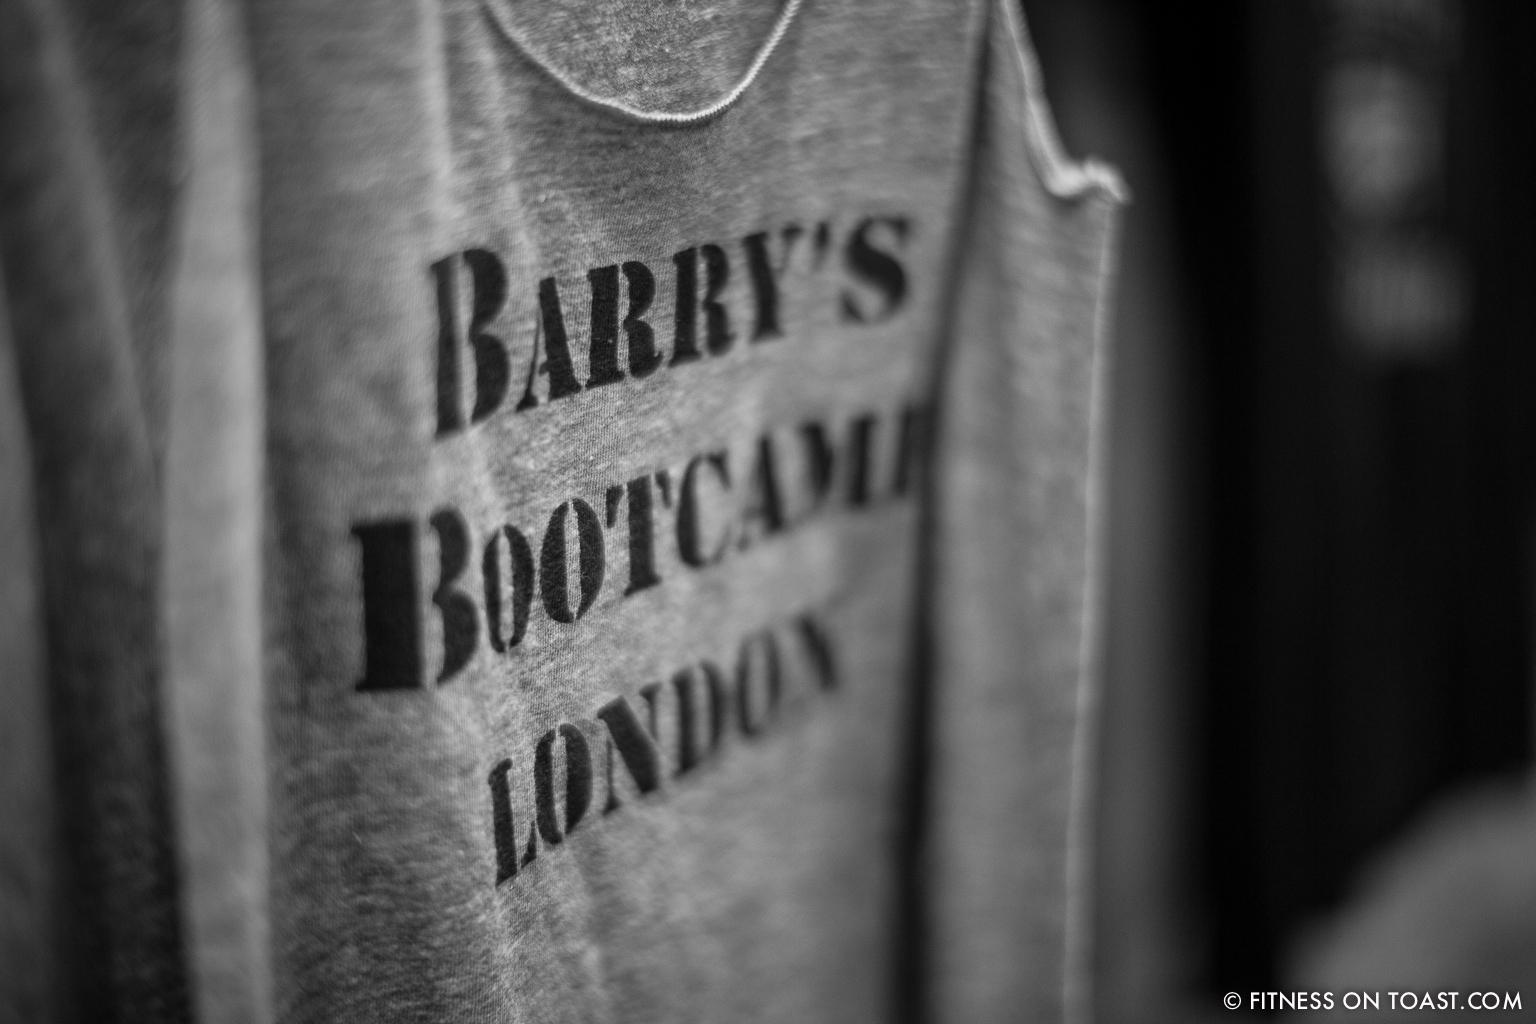 BarrysBootcampPost-11